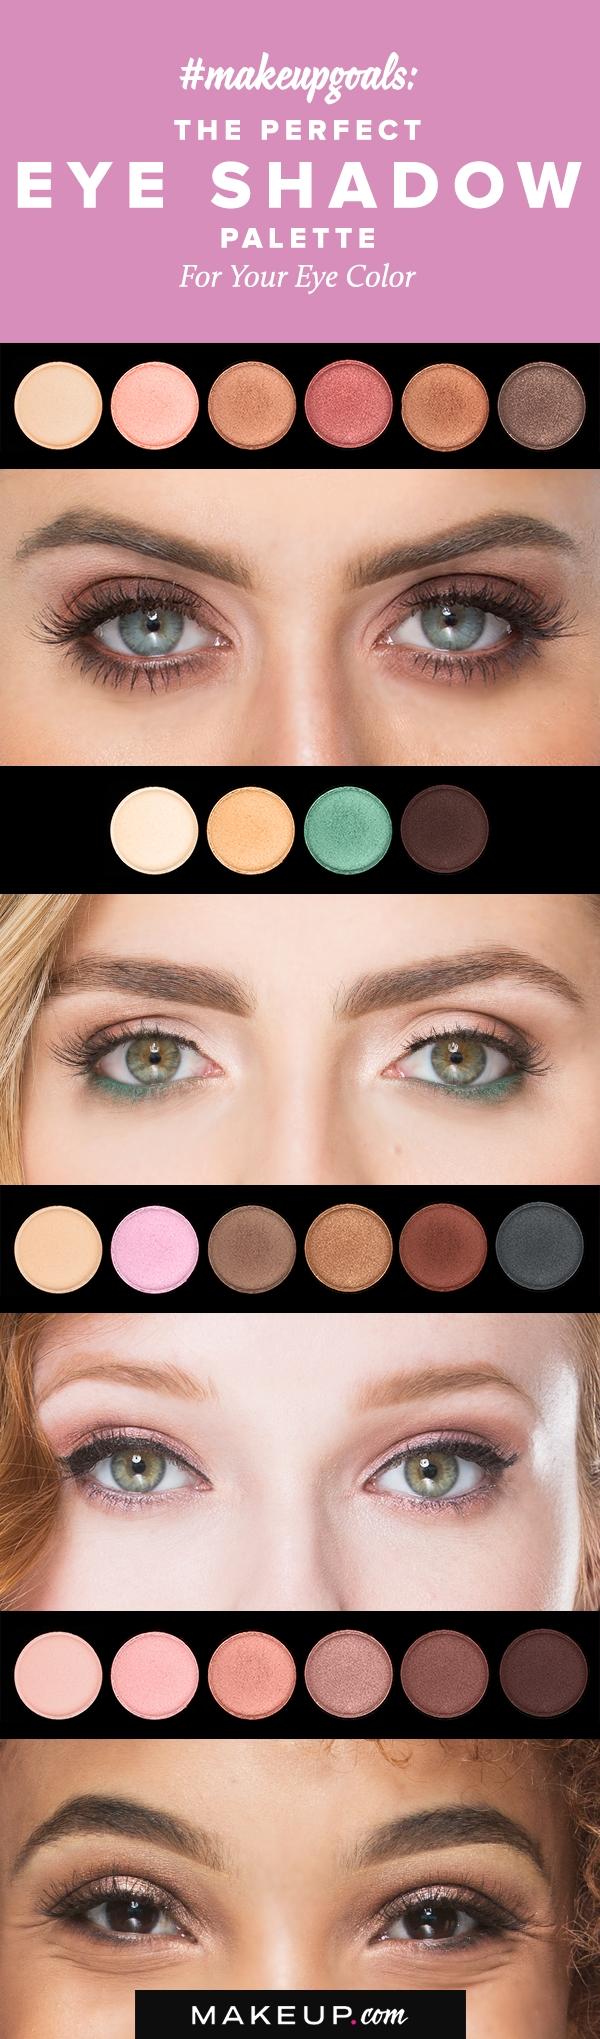 best eyeshadow palettes for green eyes - wavy haircut